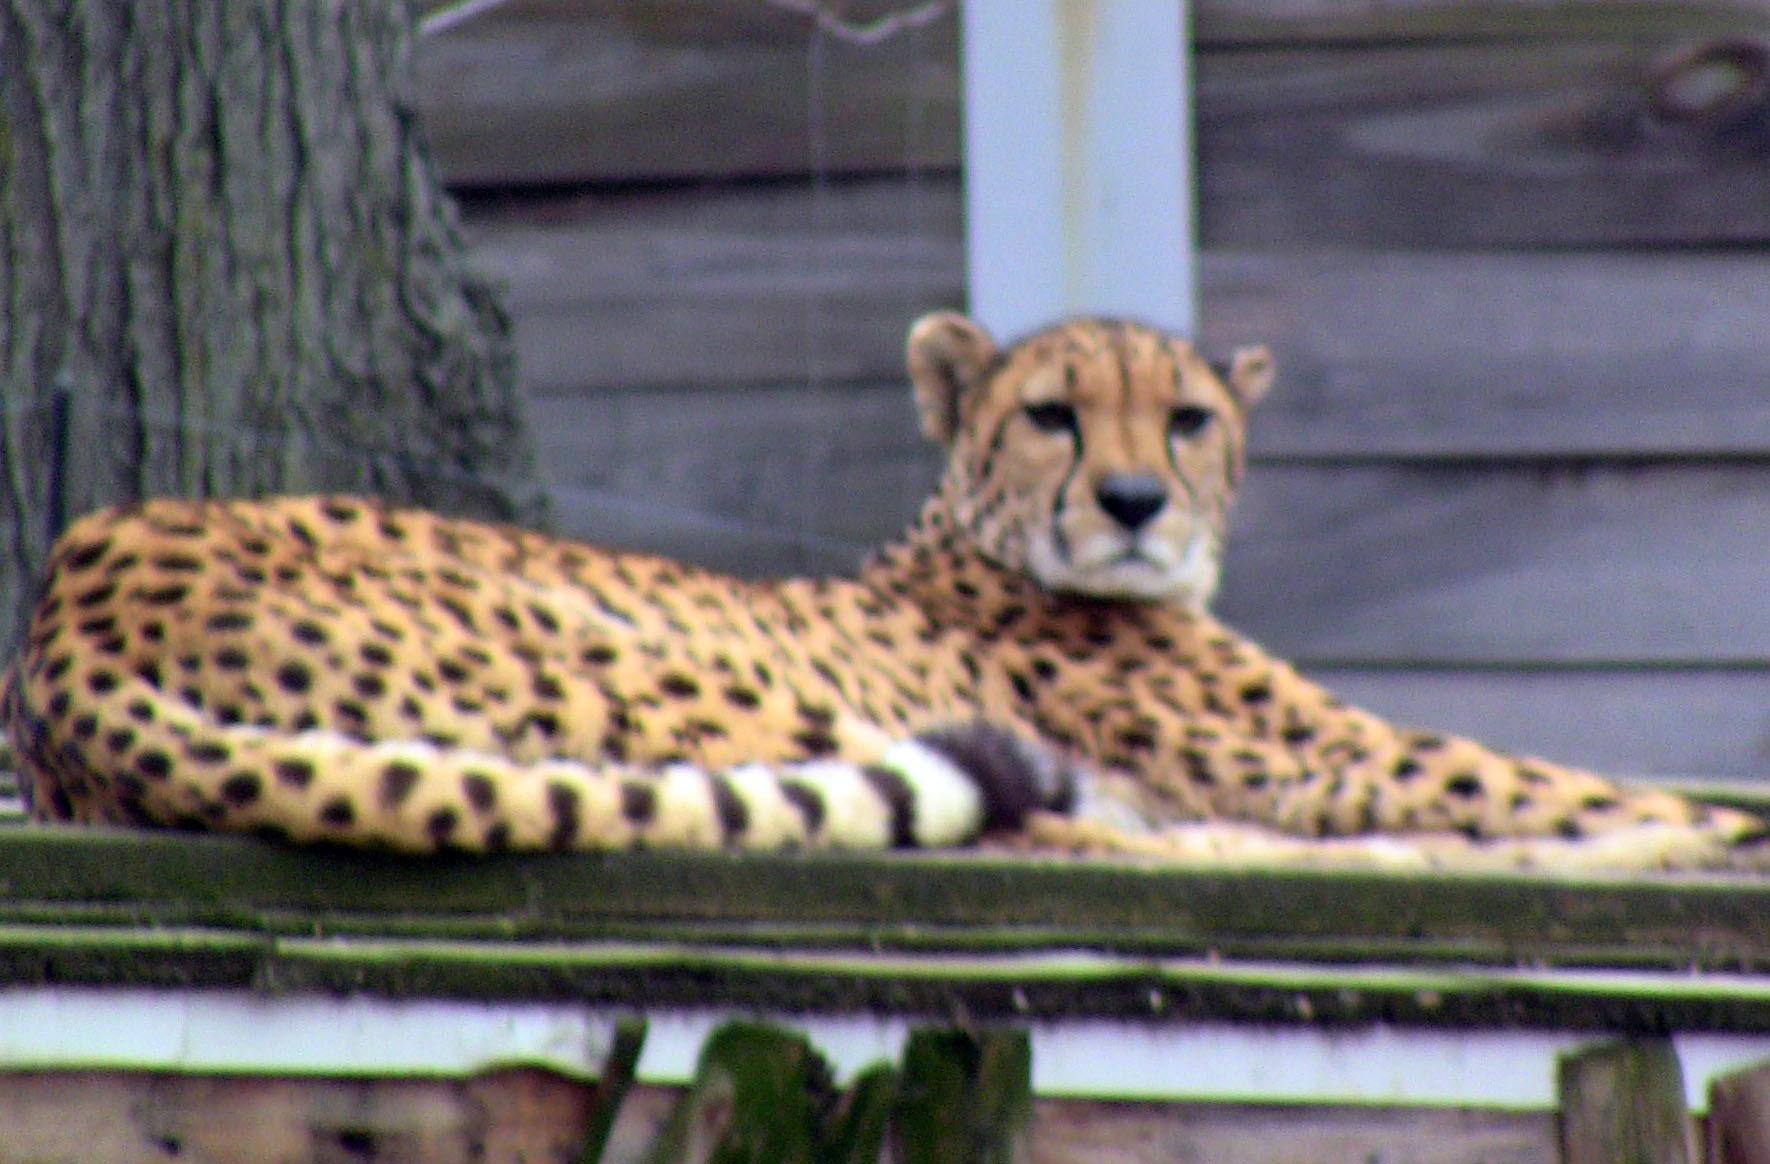 3808907efefbd9274c25_Cubs_at_zoo_-_cheetah.jpg